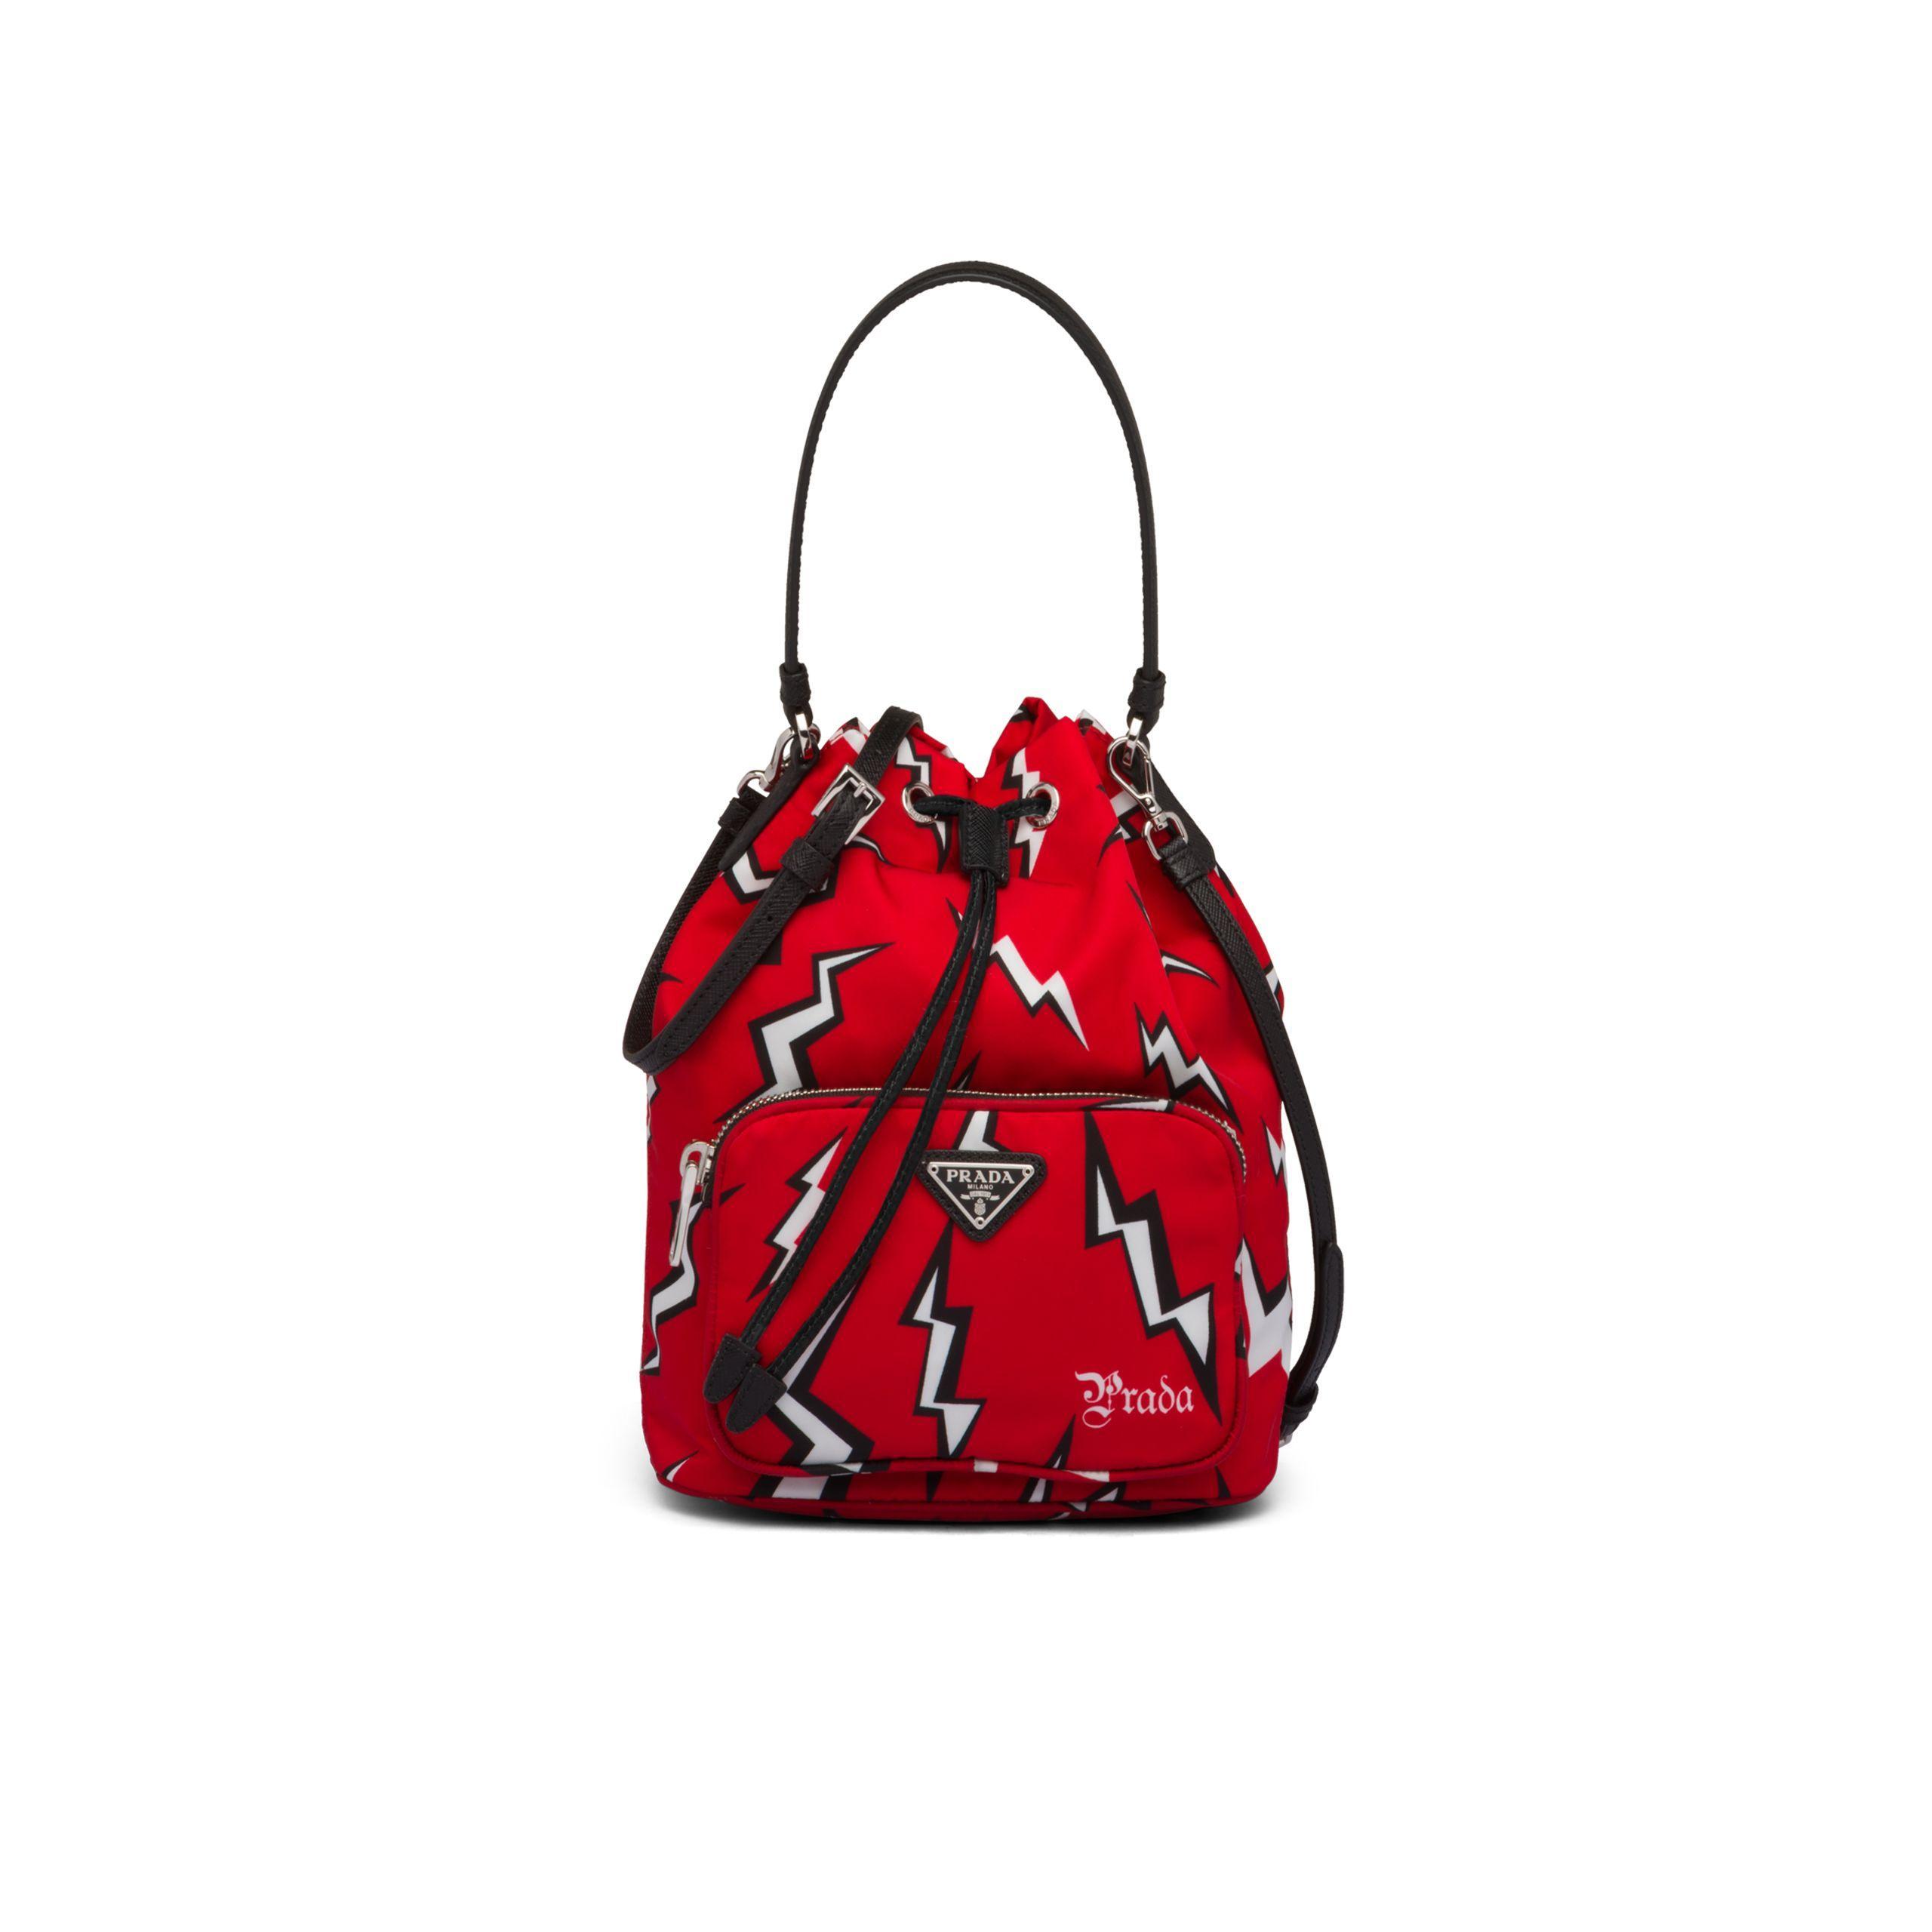 0ffcb18299 Prada Printed Nylon Shoulder Bag in Red - Lyst